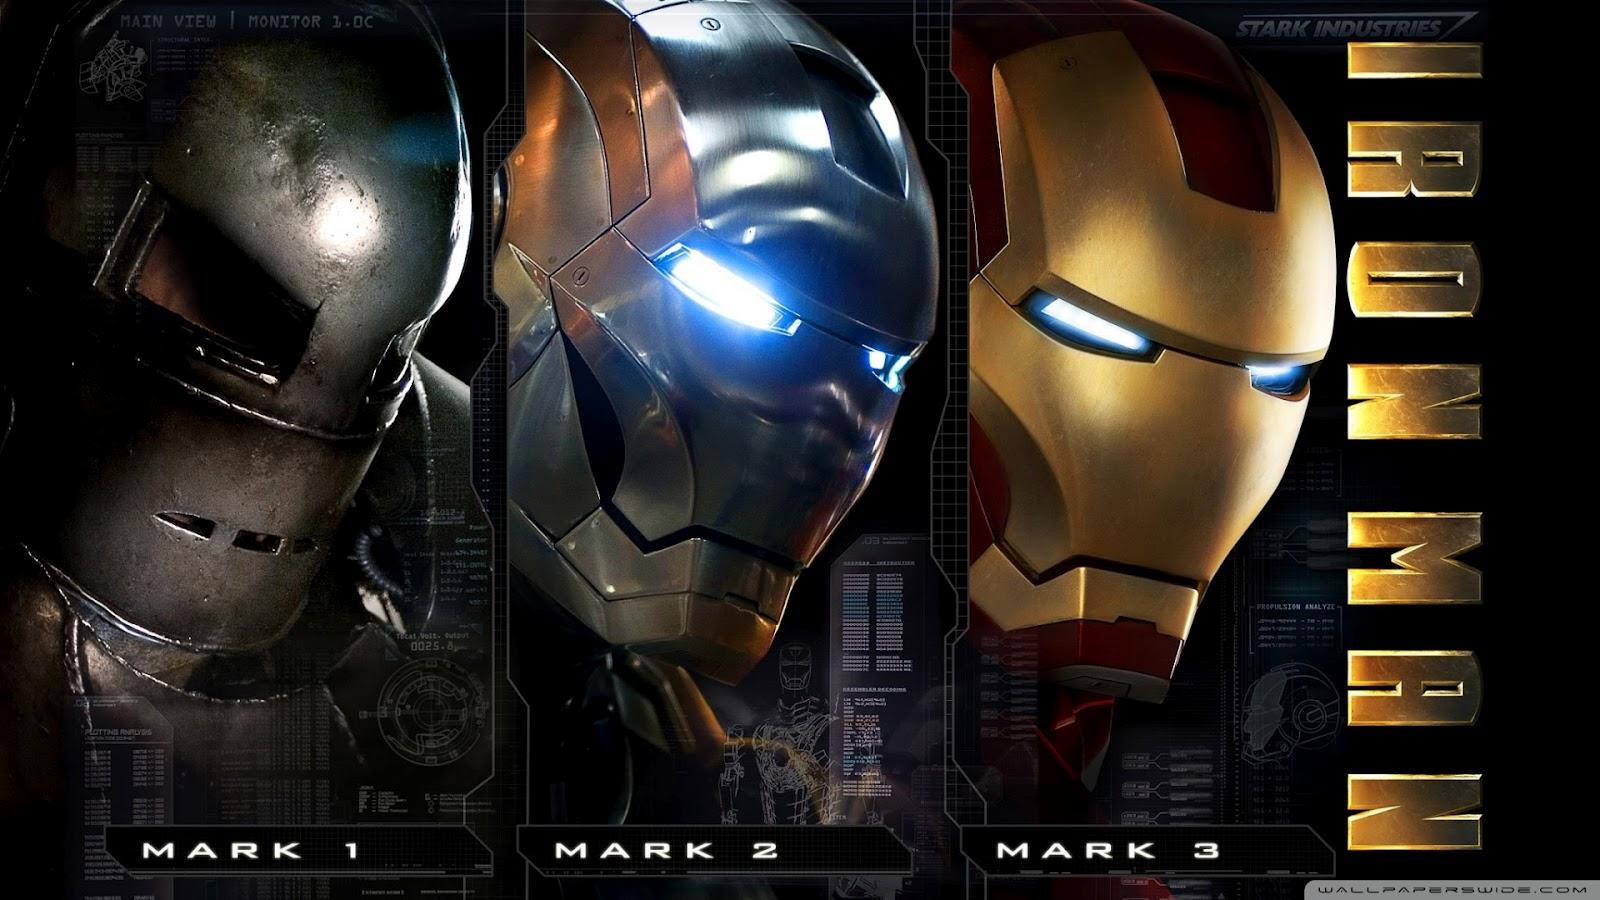 http://3.bp.blogspot.com/-tYvwhlt1MzY/UBHYYmHQo_I/AAAAAAAACGw/U4RO48Jaf84/s1600/evolution_armor_iron_man-wallpaper-1920x1080.jpg